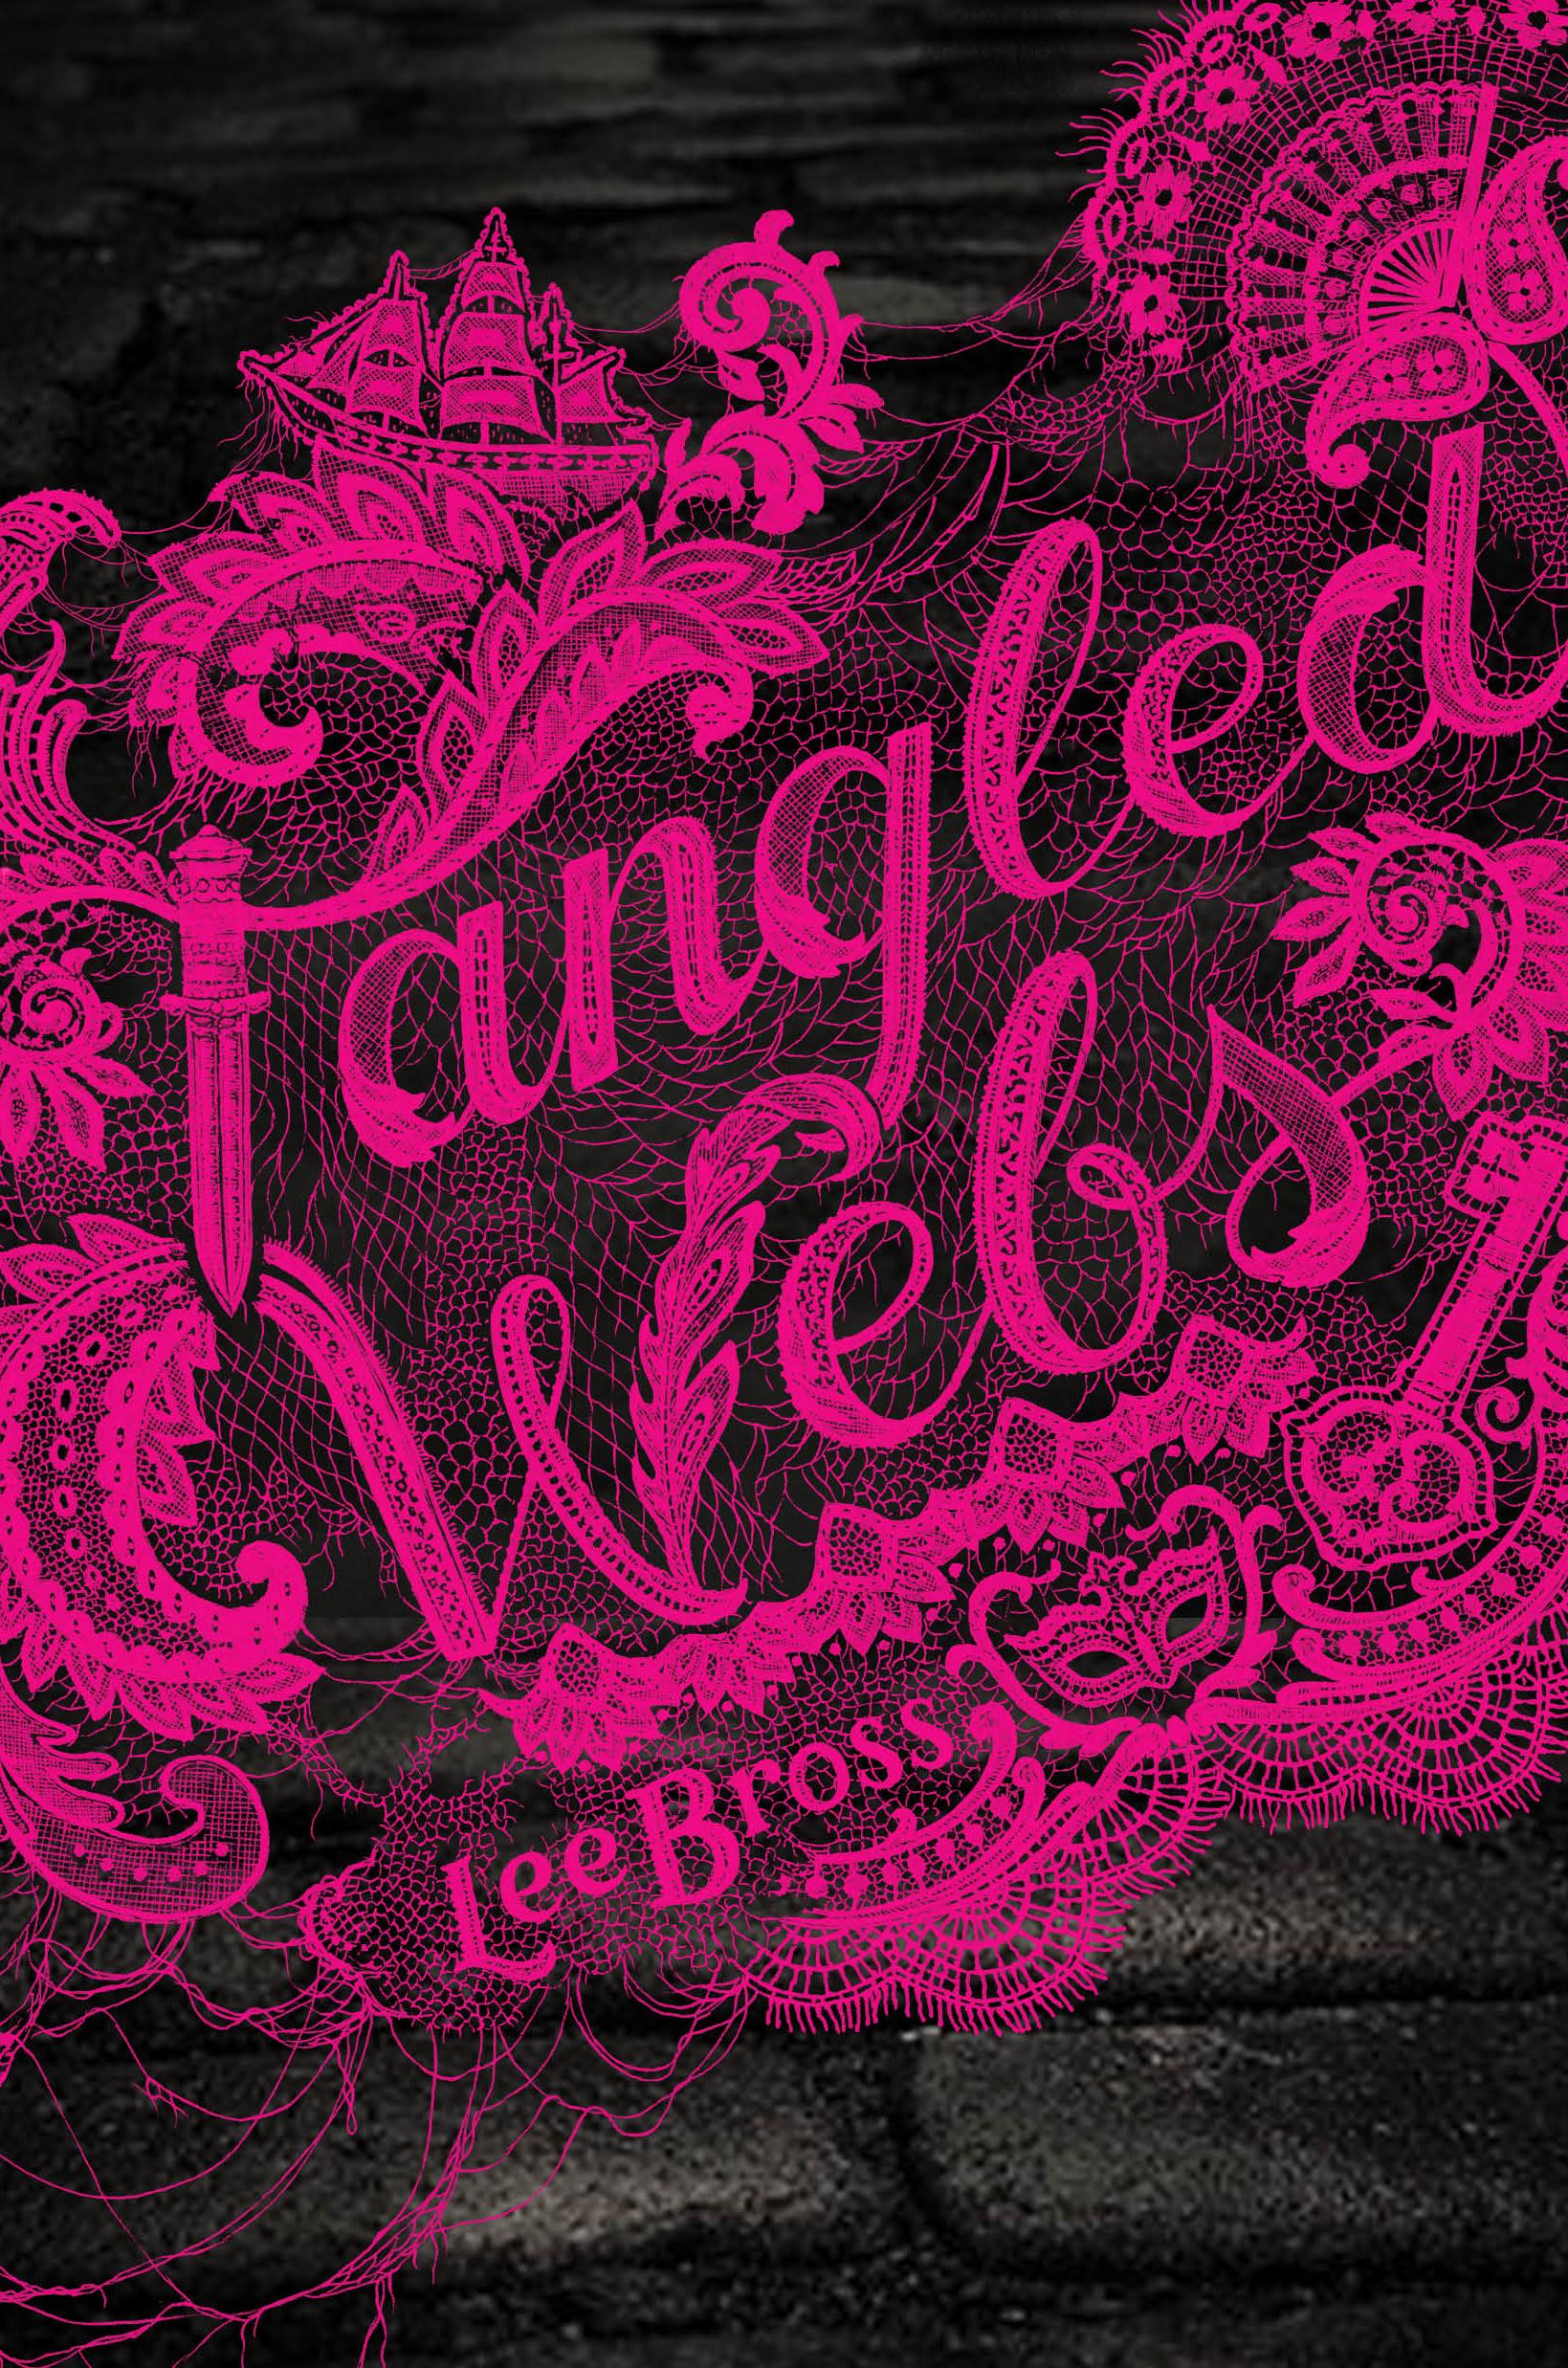 Tangled Webs.jpg